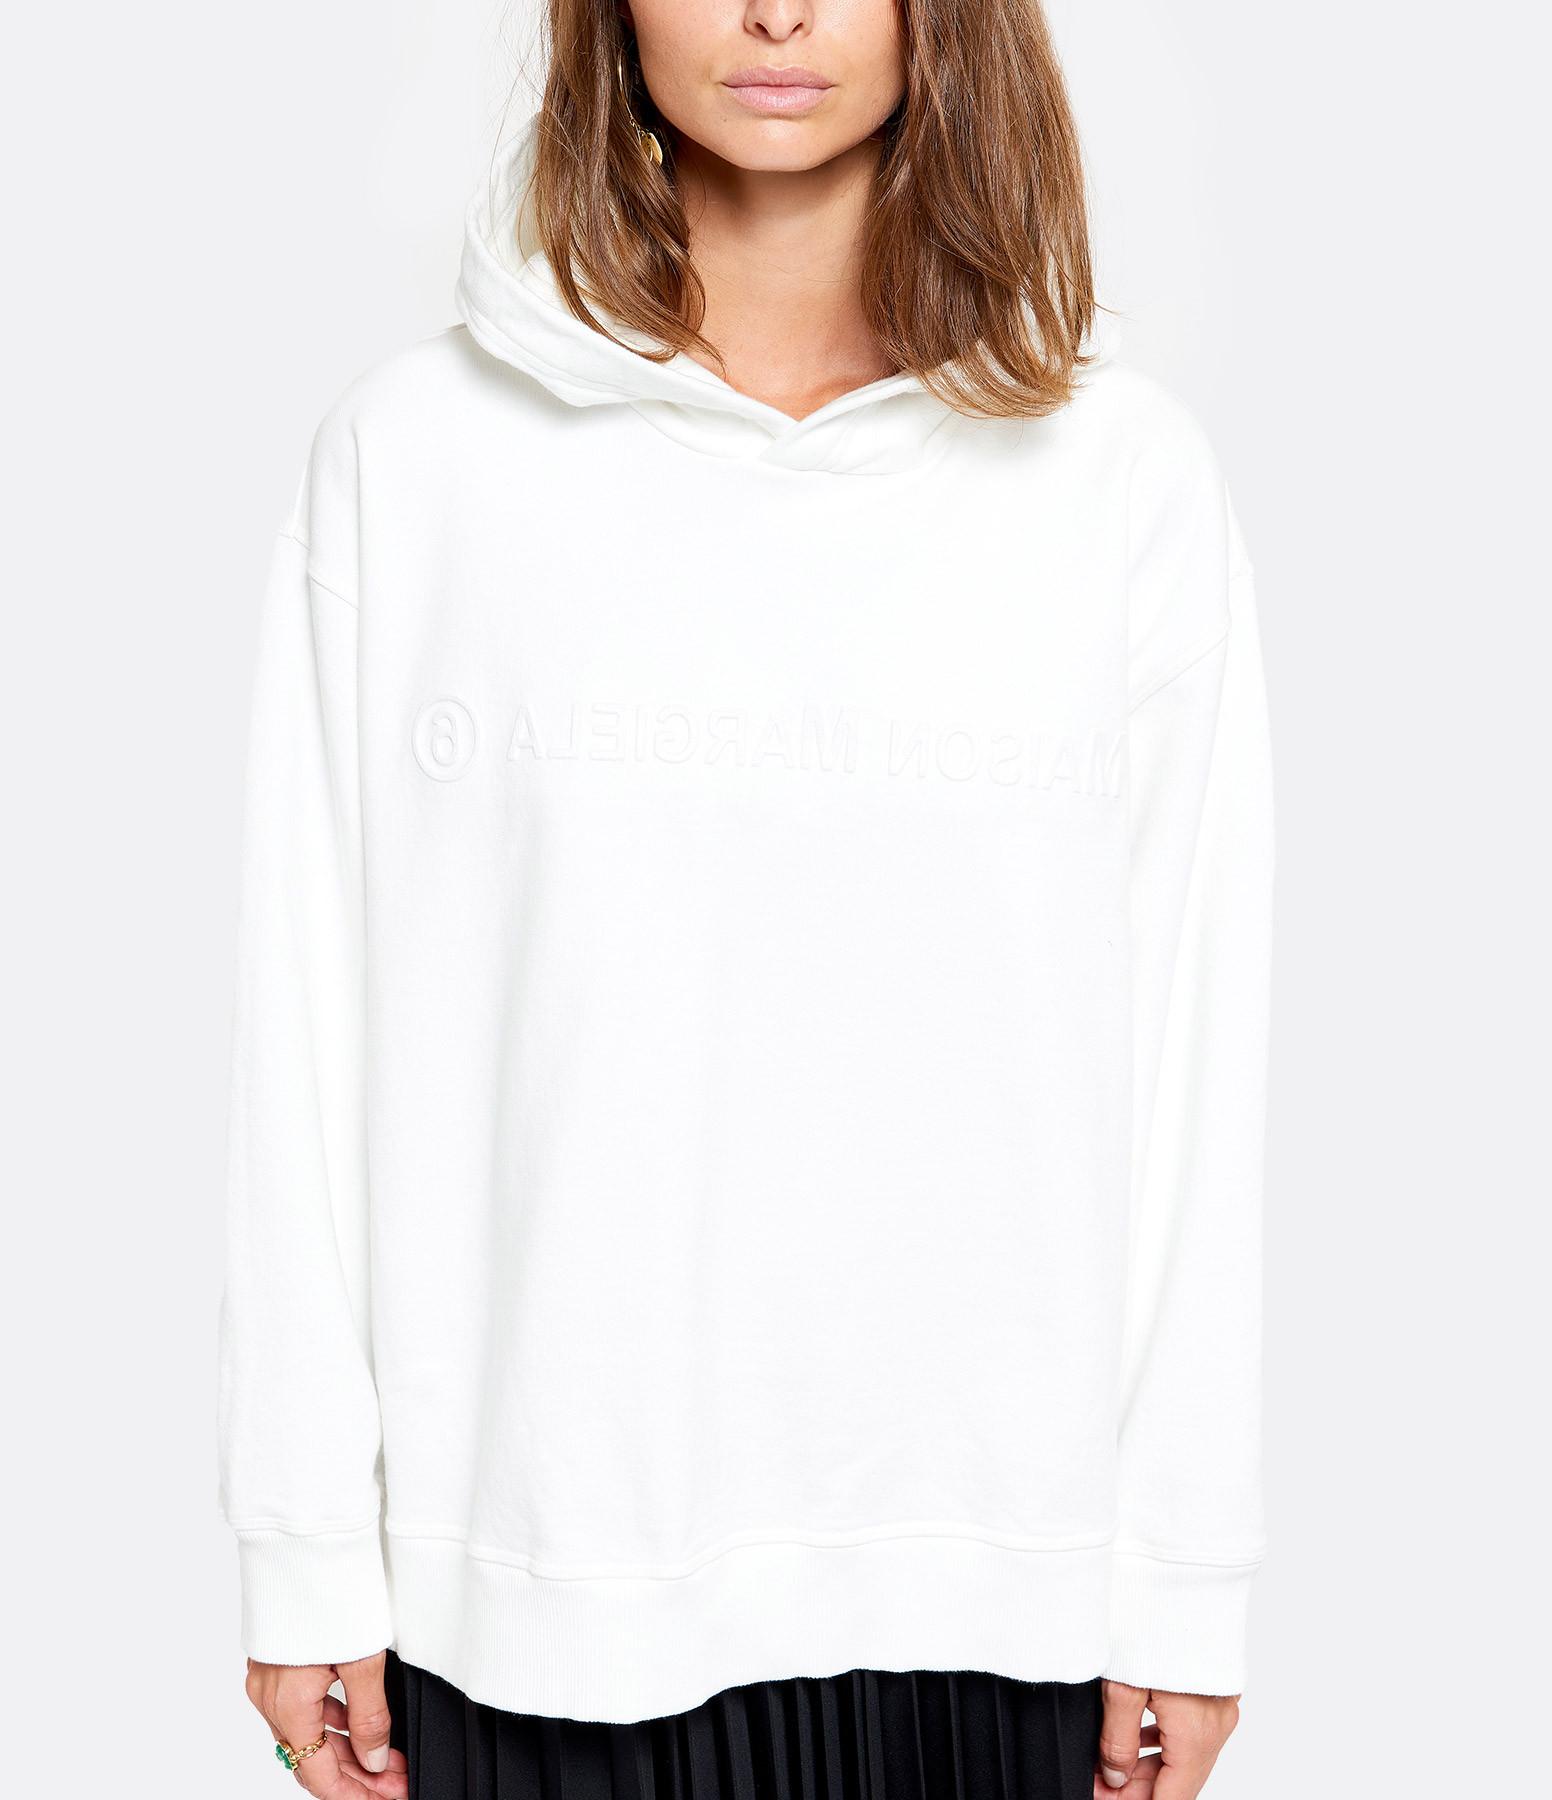 MM6 MAISON MARGIELA - Sweatshirt Imprimé Beige